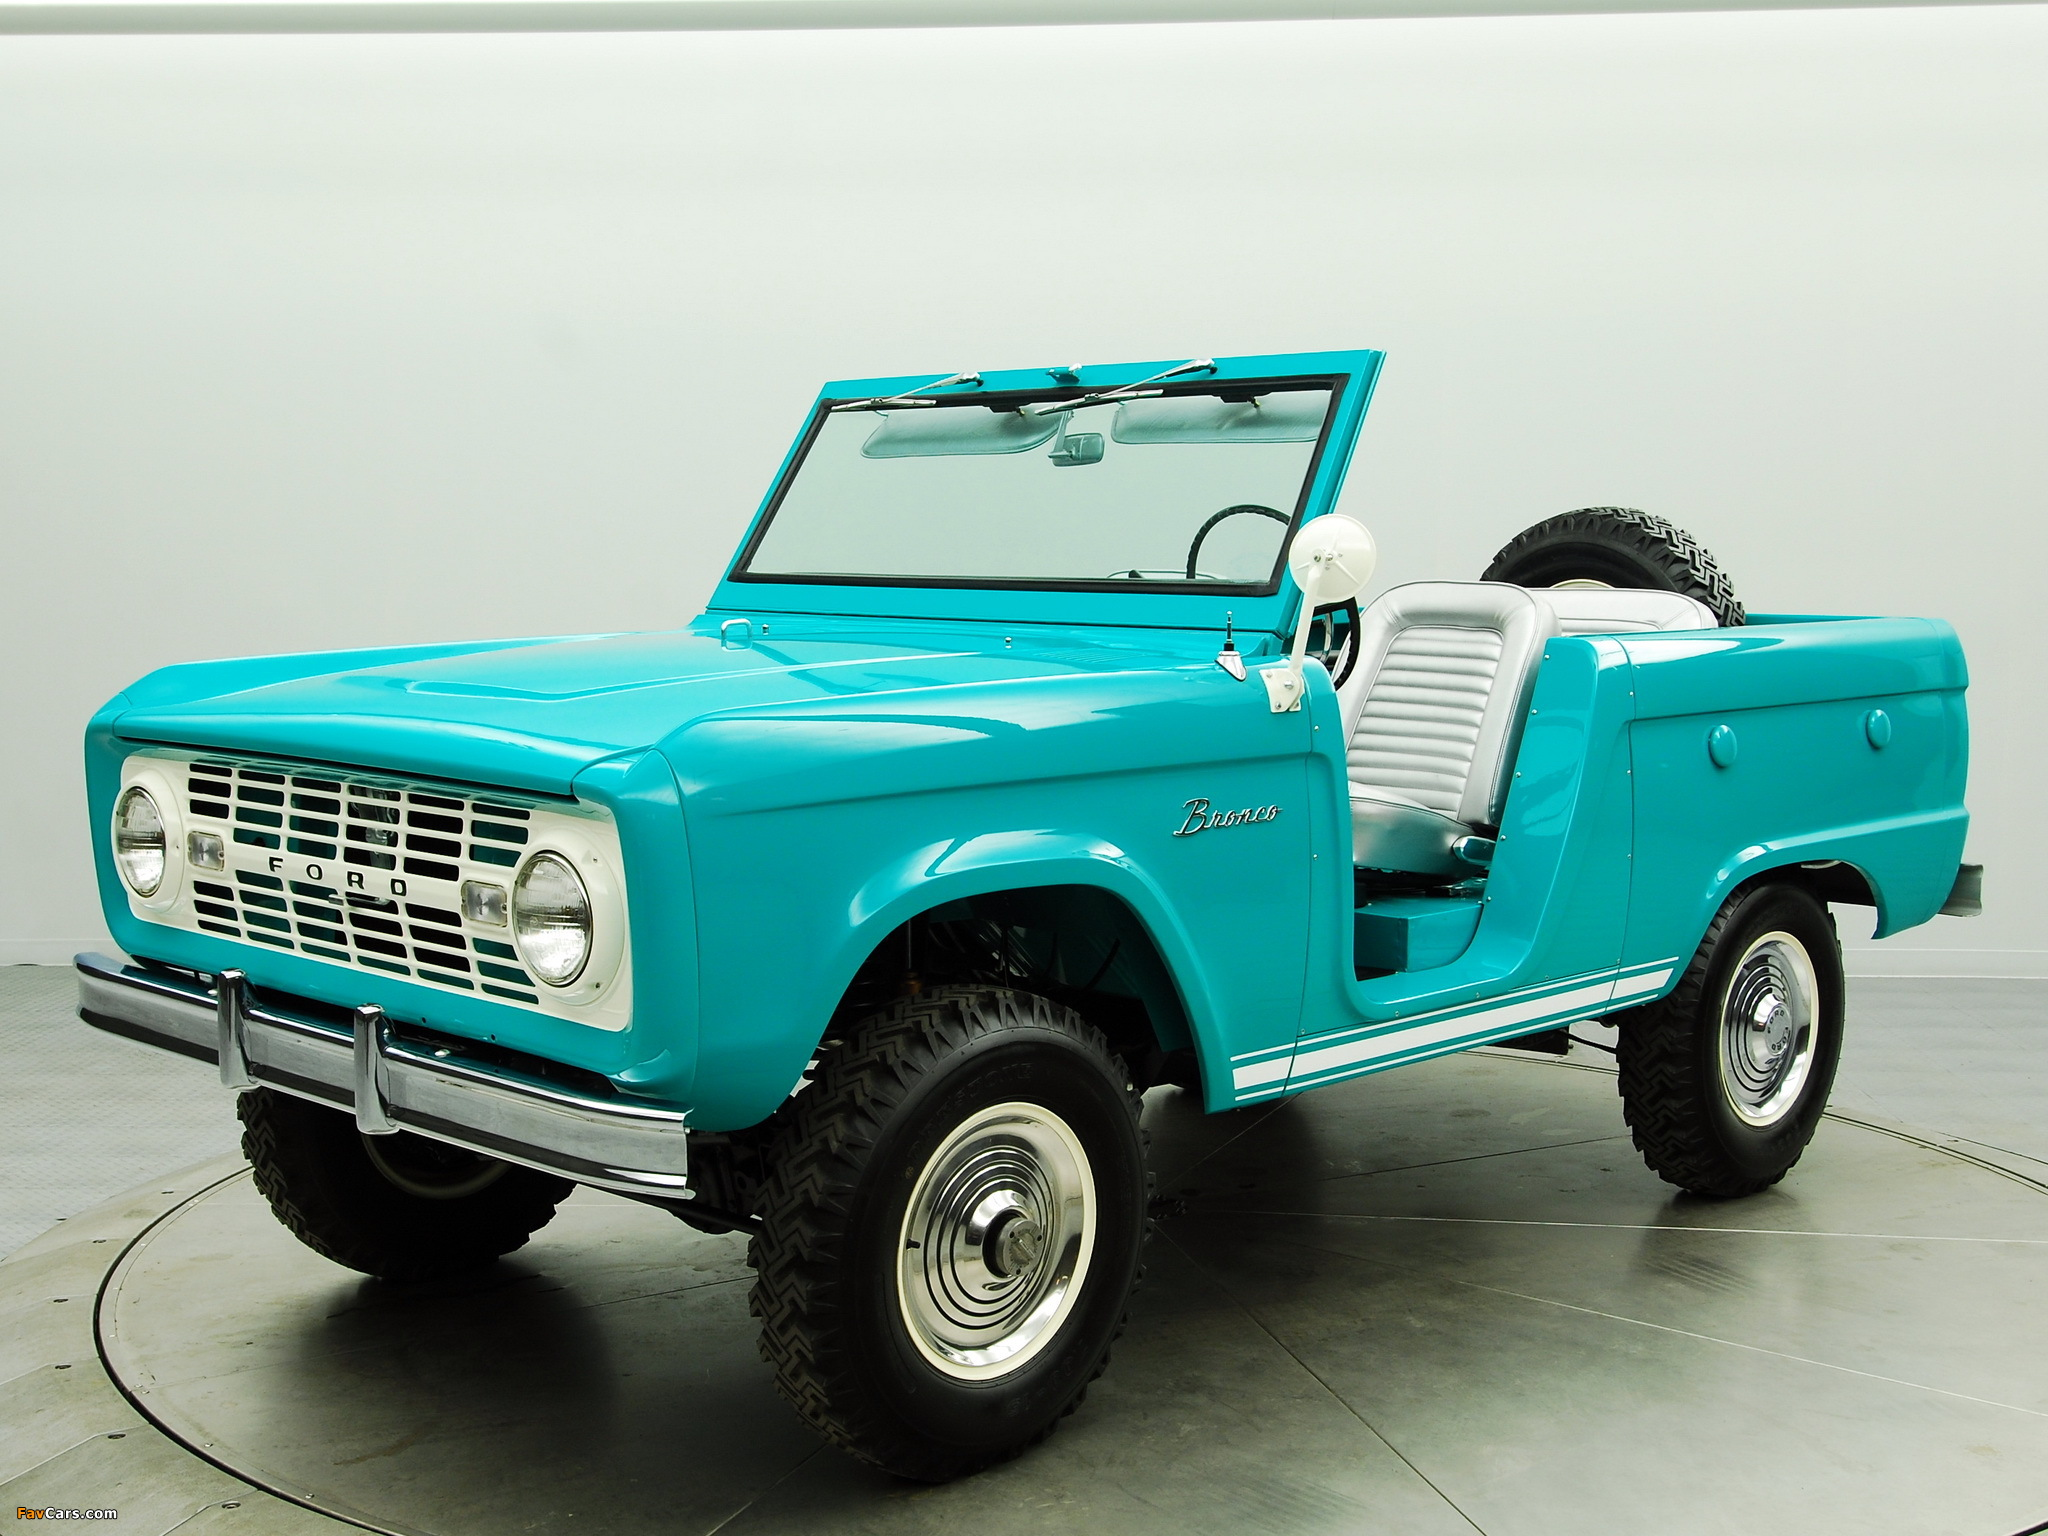 1960s ford trucks for sale autos post. Black Bedroom Furniture Sets. Home Design Ideas